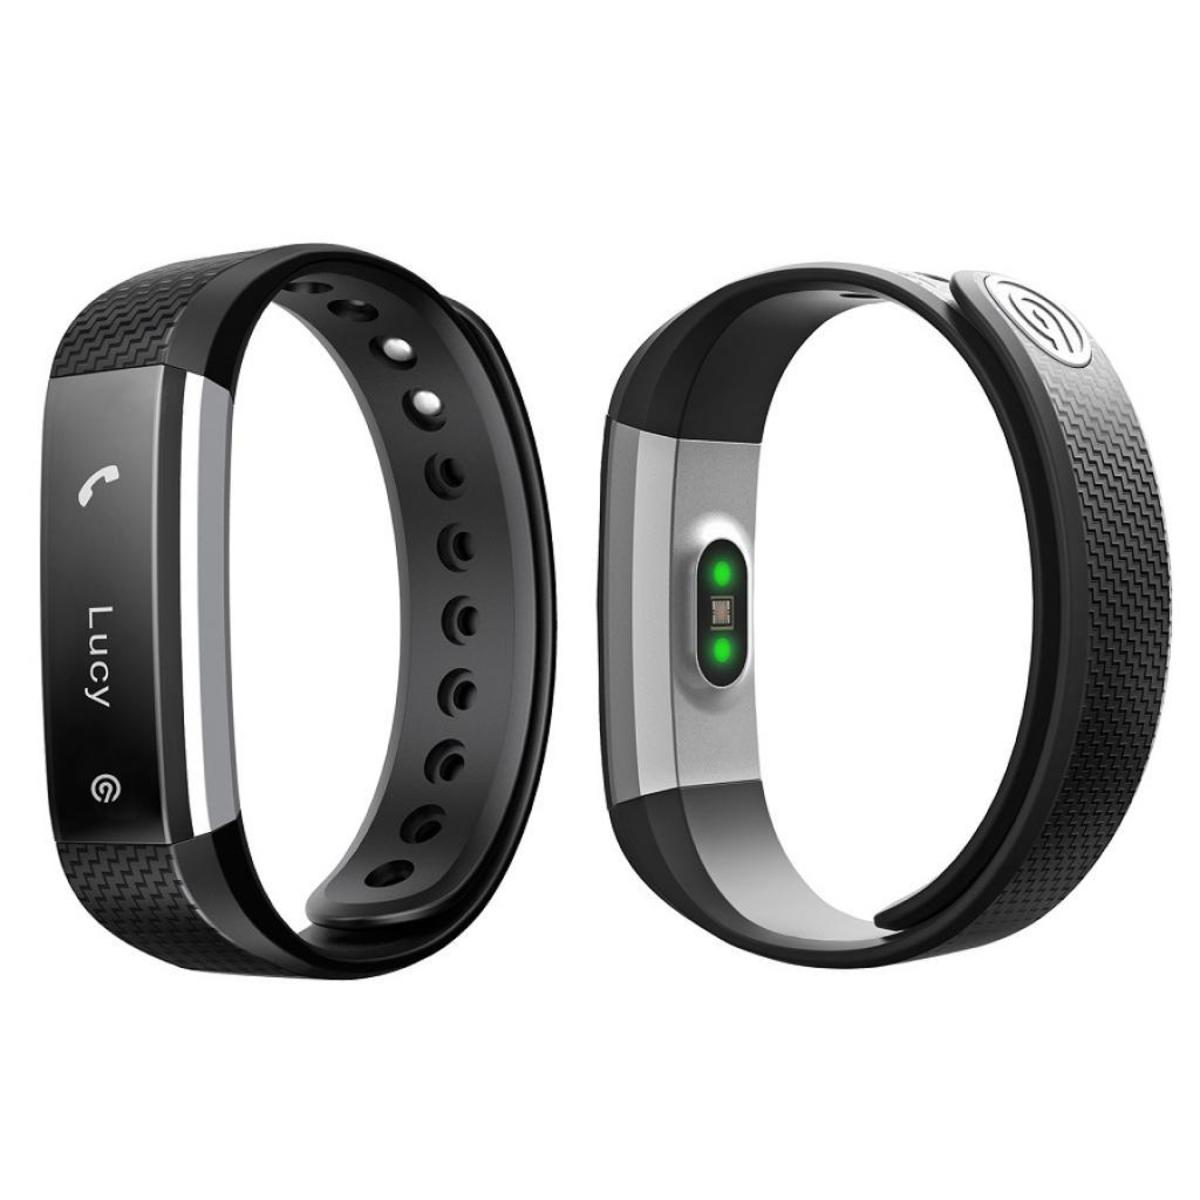 Bild 3 von NINETEC Smartfit F3HR Fitnesstracker